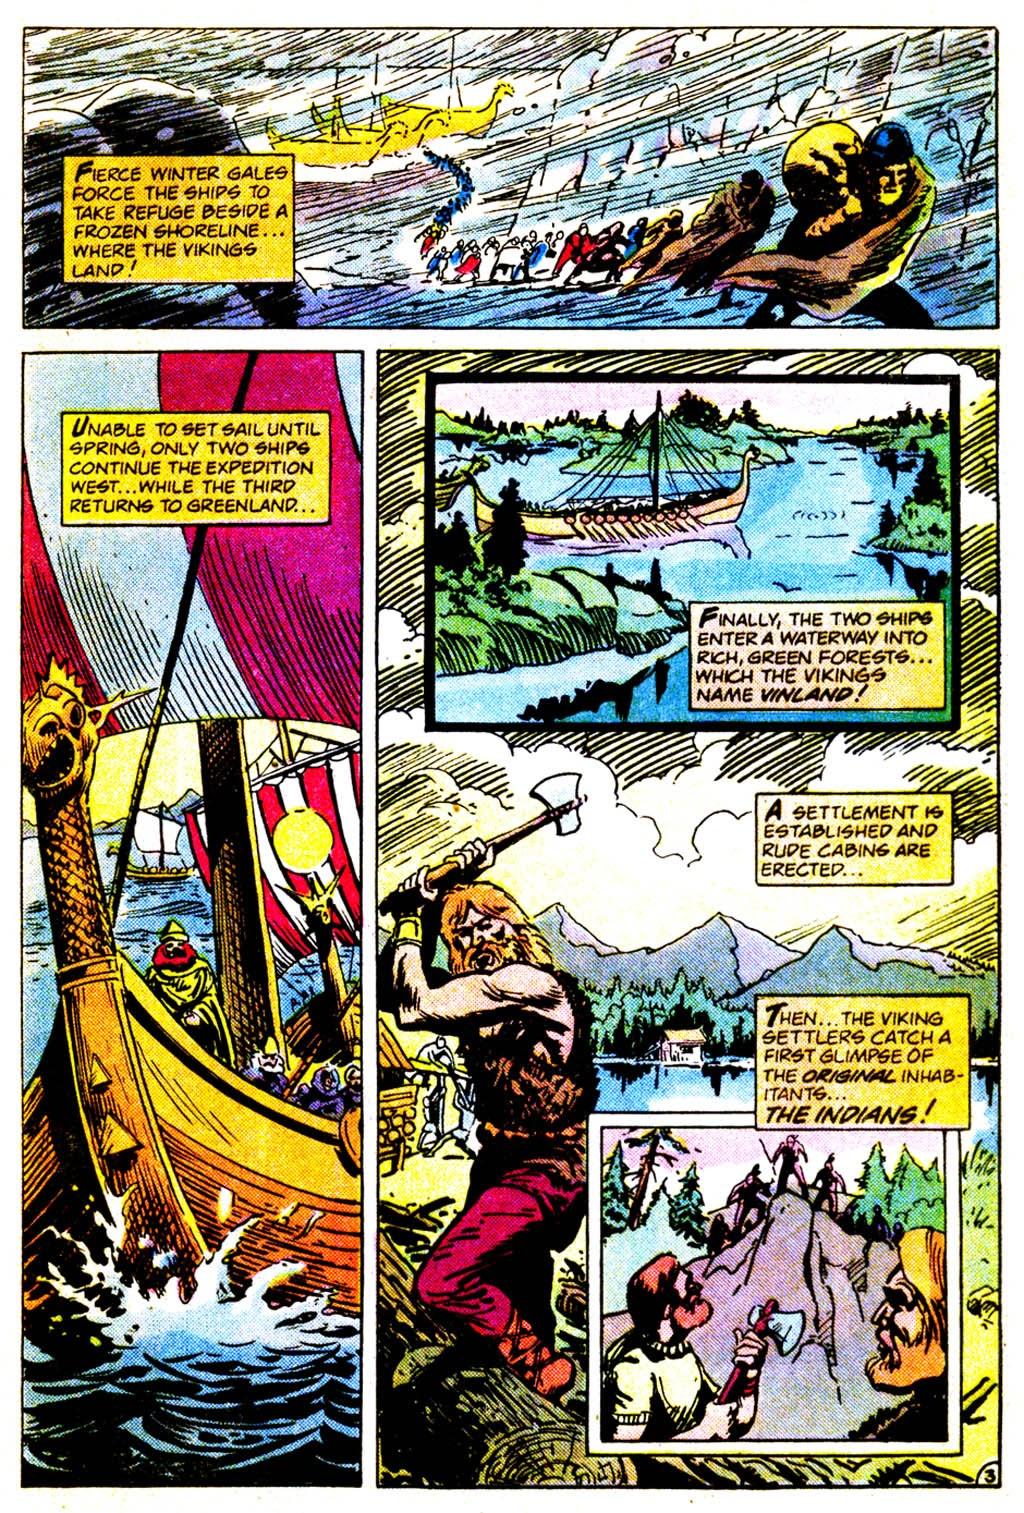 Read online Sgt. Rock comic -  Issue #373 - 20